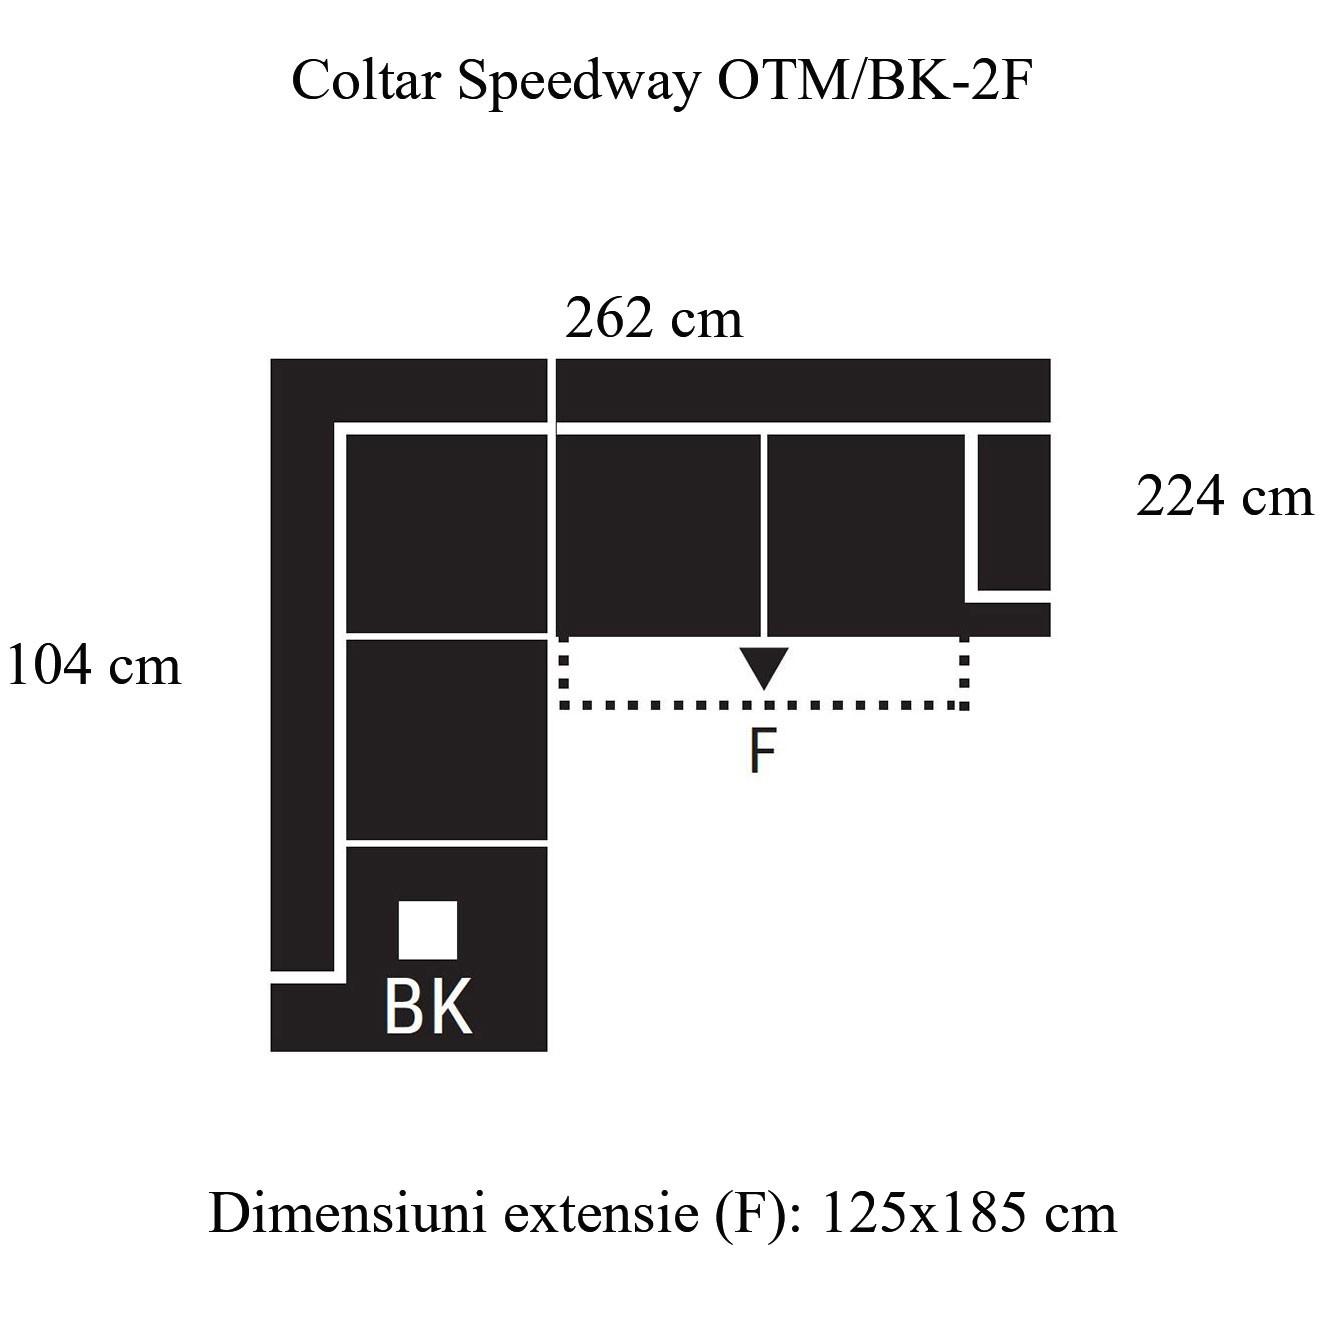 Coltar living extensibil pe dreapta Speedway OTM/BK-2F, cu lada, gri deschis + gri inchis, 262 x 224 x 95 cm, 2C